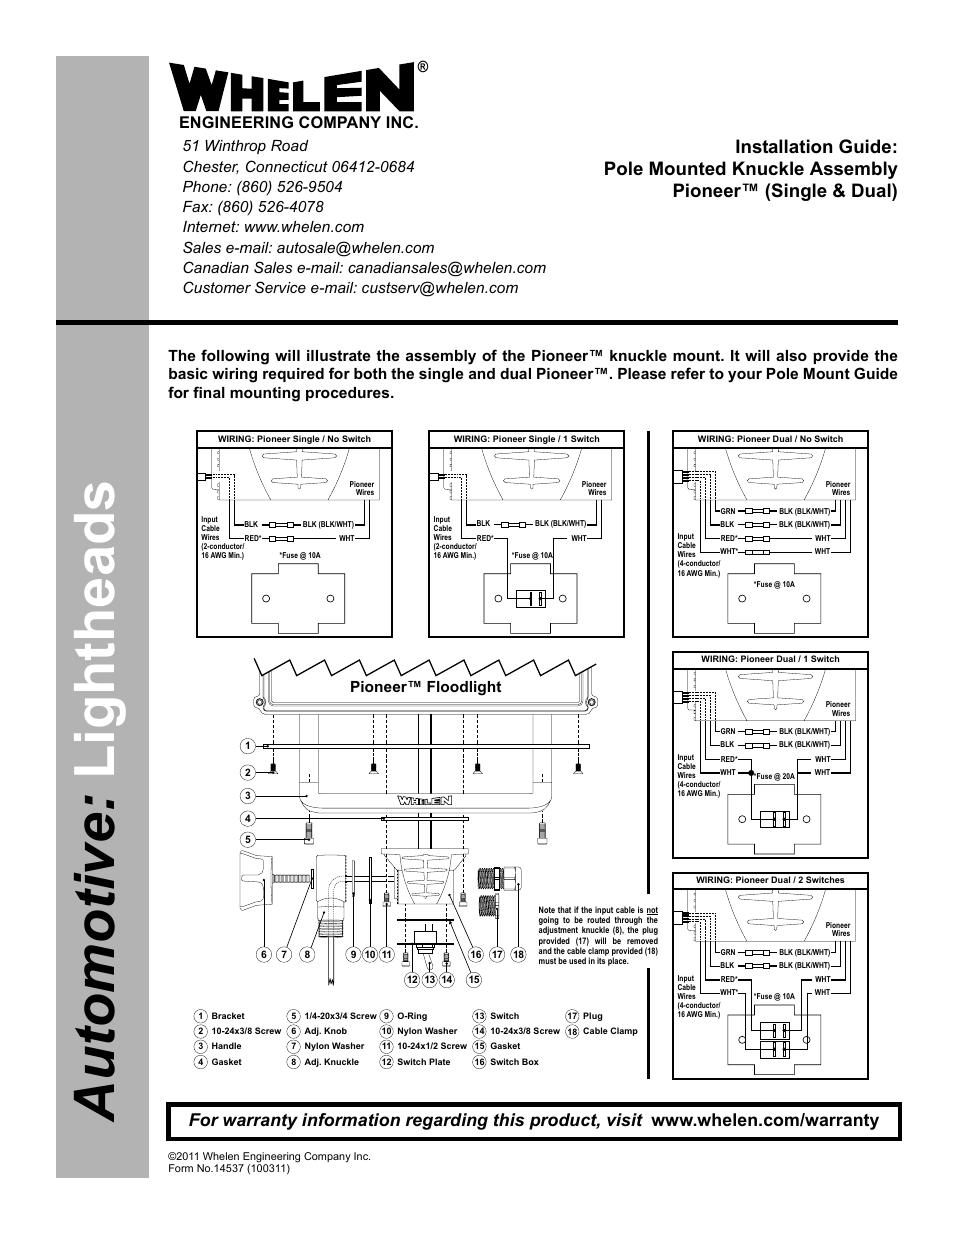 Whelen Pfa1p User Manual 1 Page Also For Pfa1p1 Pfp1p Pfp1p1 Switch Box Wiring Diagram Pfa2p Pfa2p1 Pfp2p Pfp2p1 Psp1p Psp1p1 Pcp2p Pcp2p2